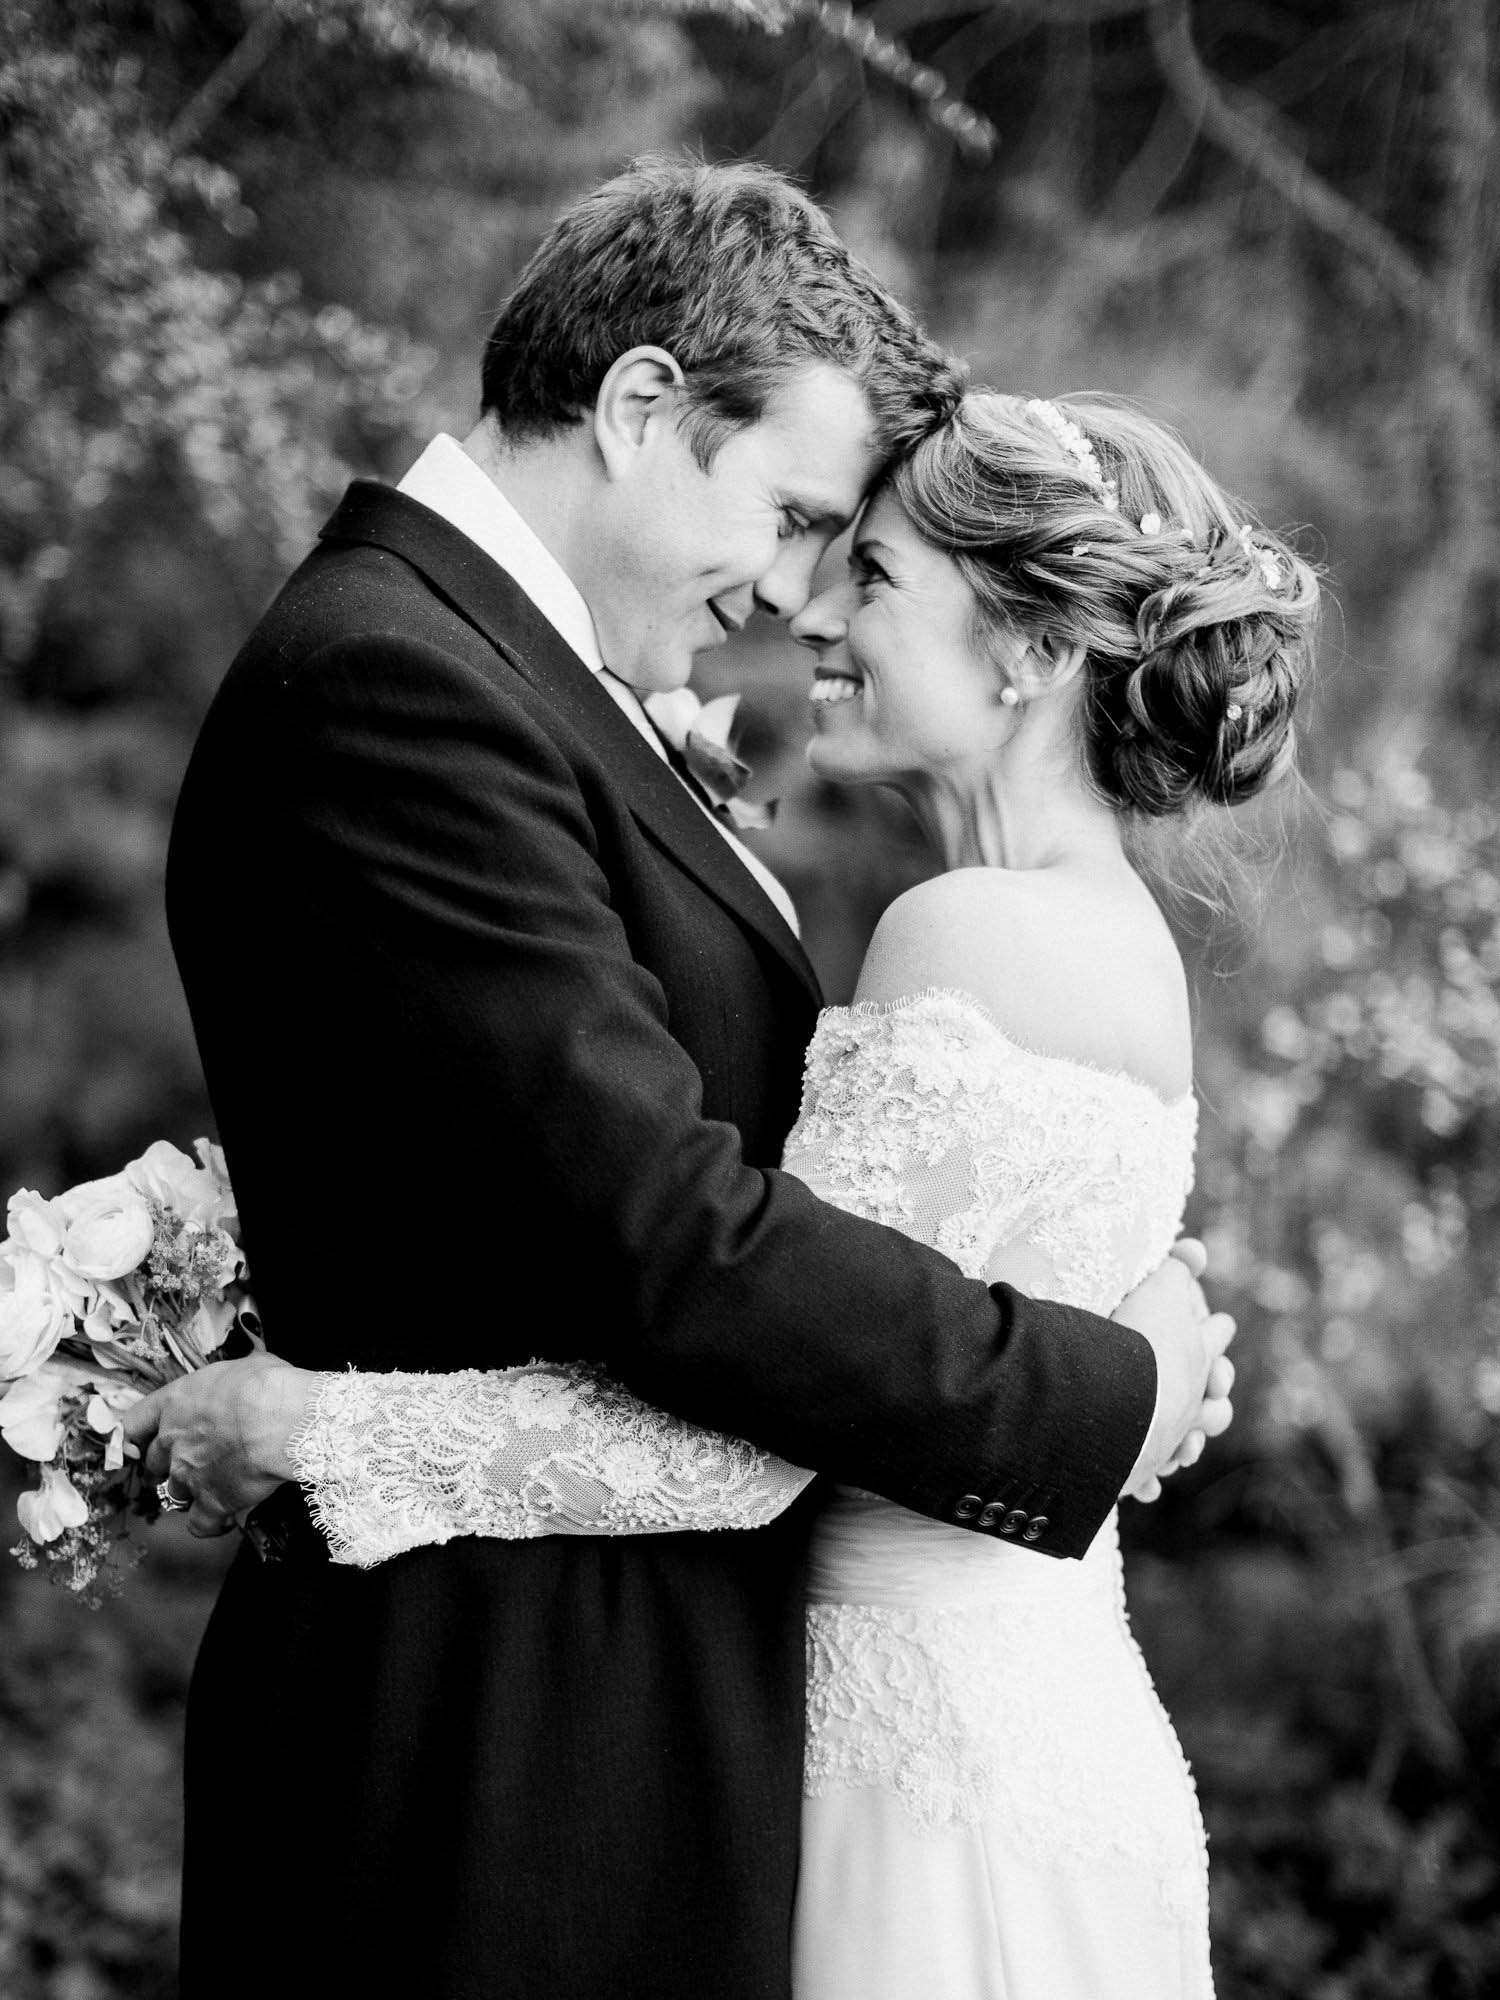 Amy O'Boyle Photography- Destination & UK Fine Art Film Wedding Photographer- English Countryside Wedding-9.jpg